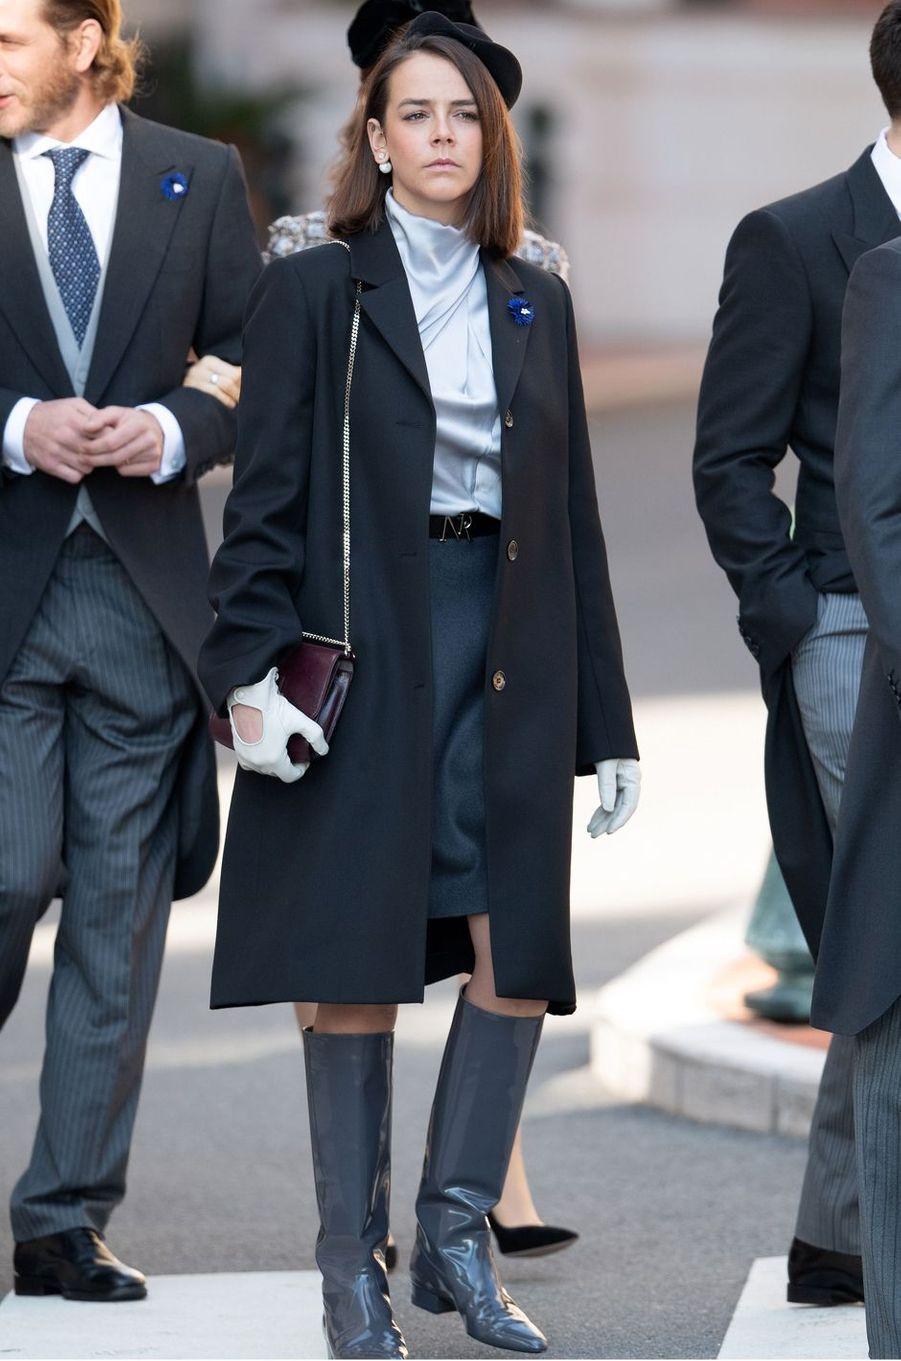 Pauline Ducruet à Monaco, le 19 novembre 2018